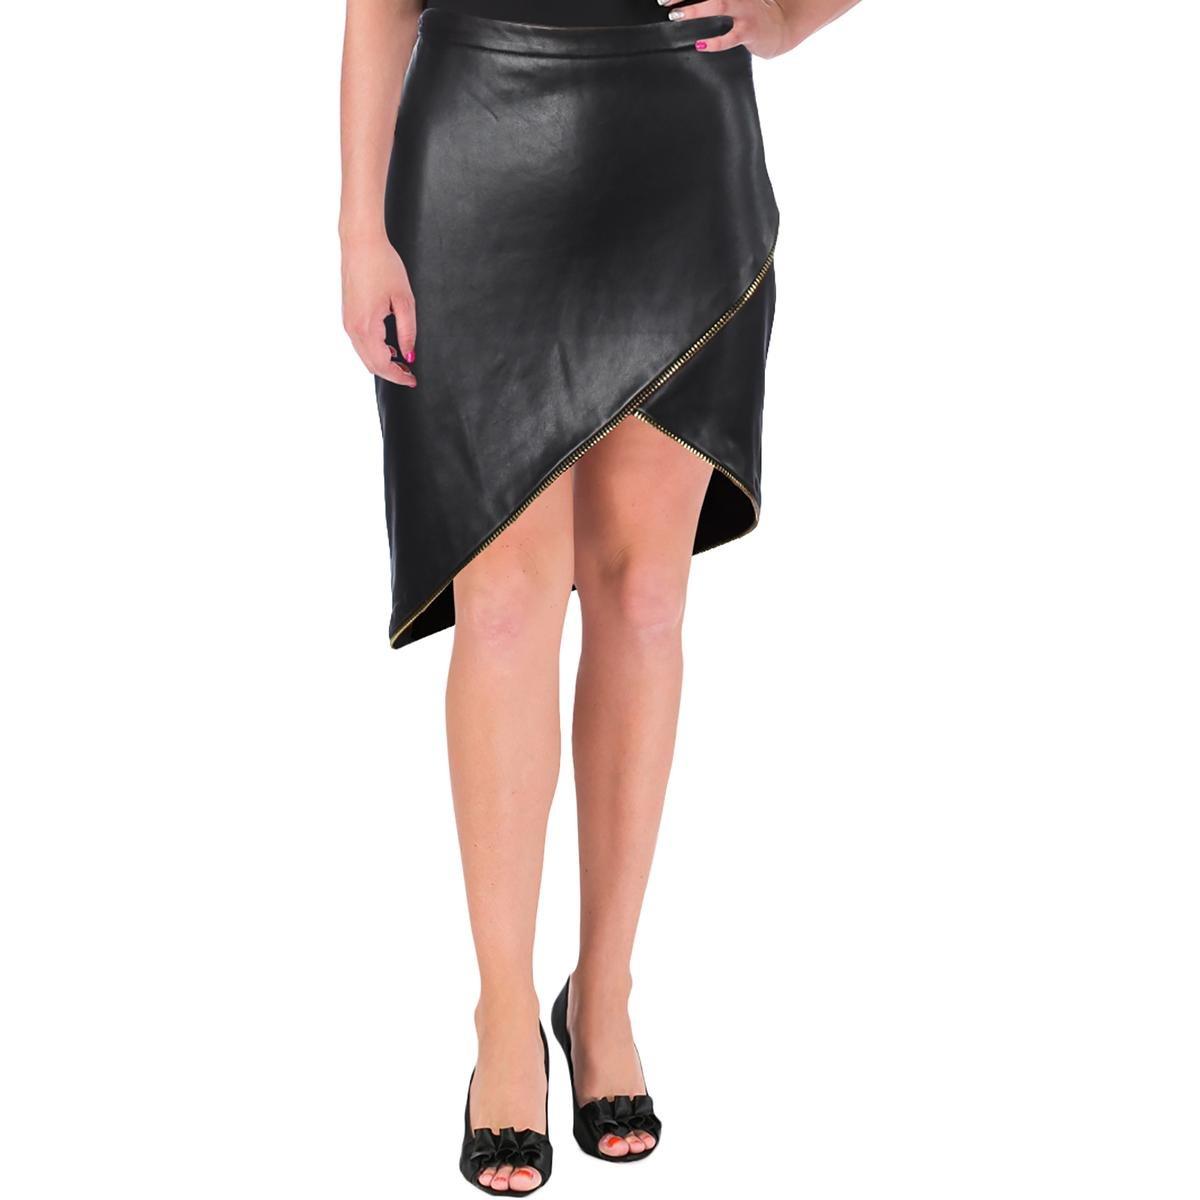 Mason by Michelle Mason Womens Asymmetrical Zipper Asymmetrical Skirt Black 8